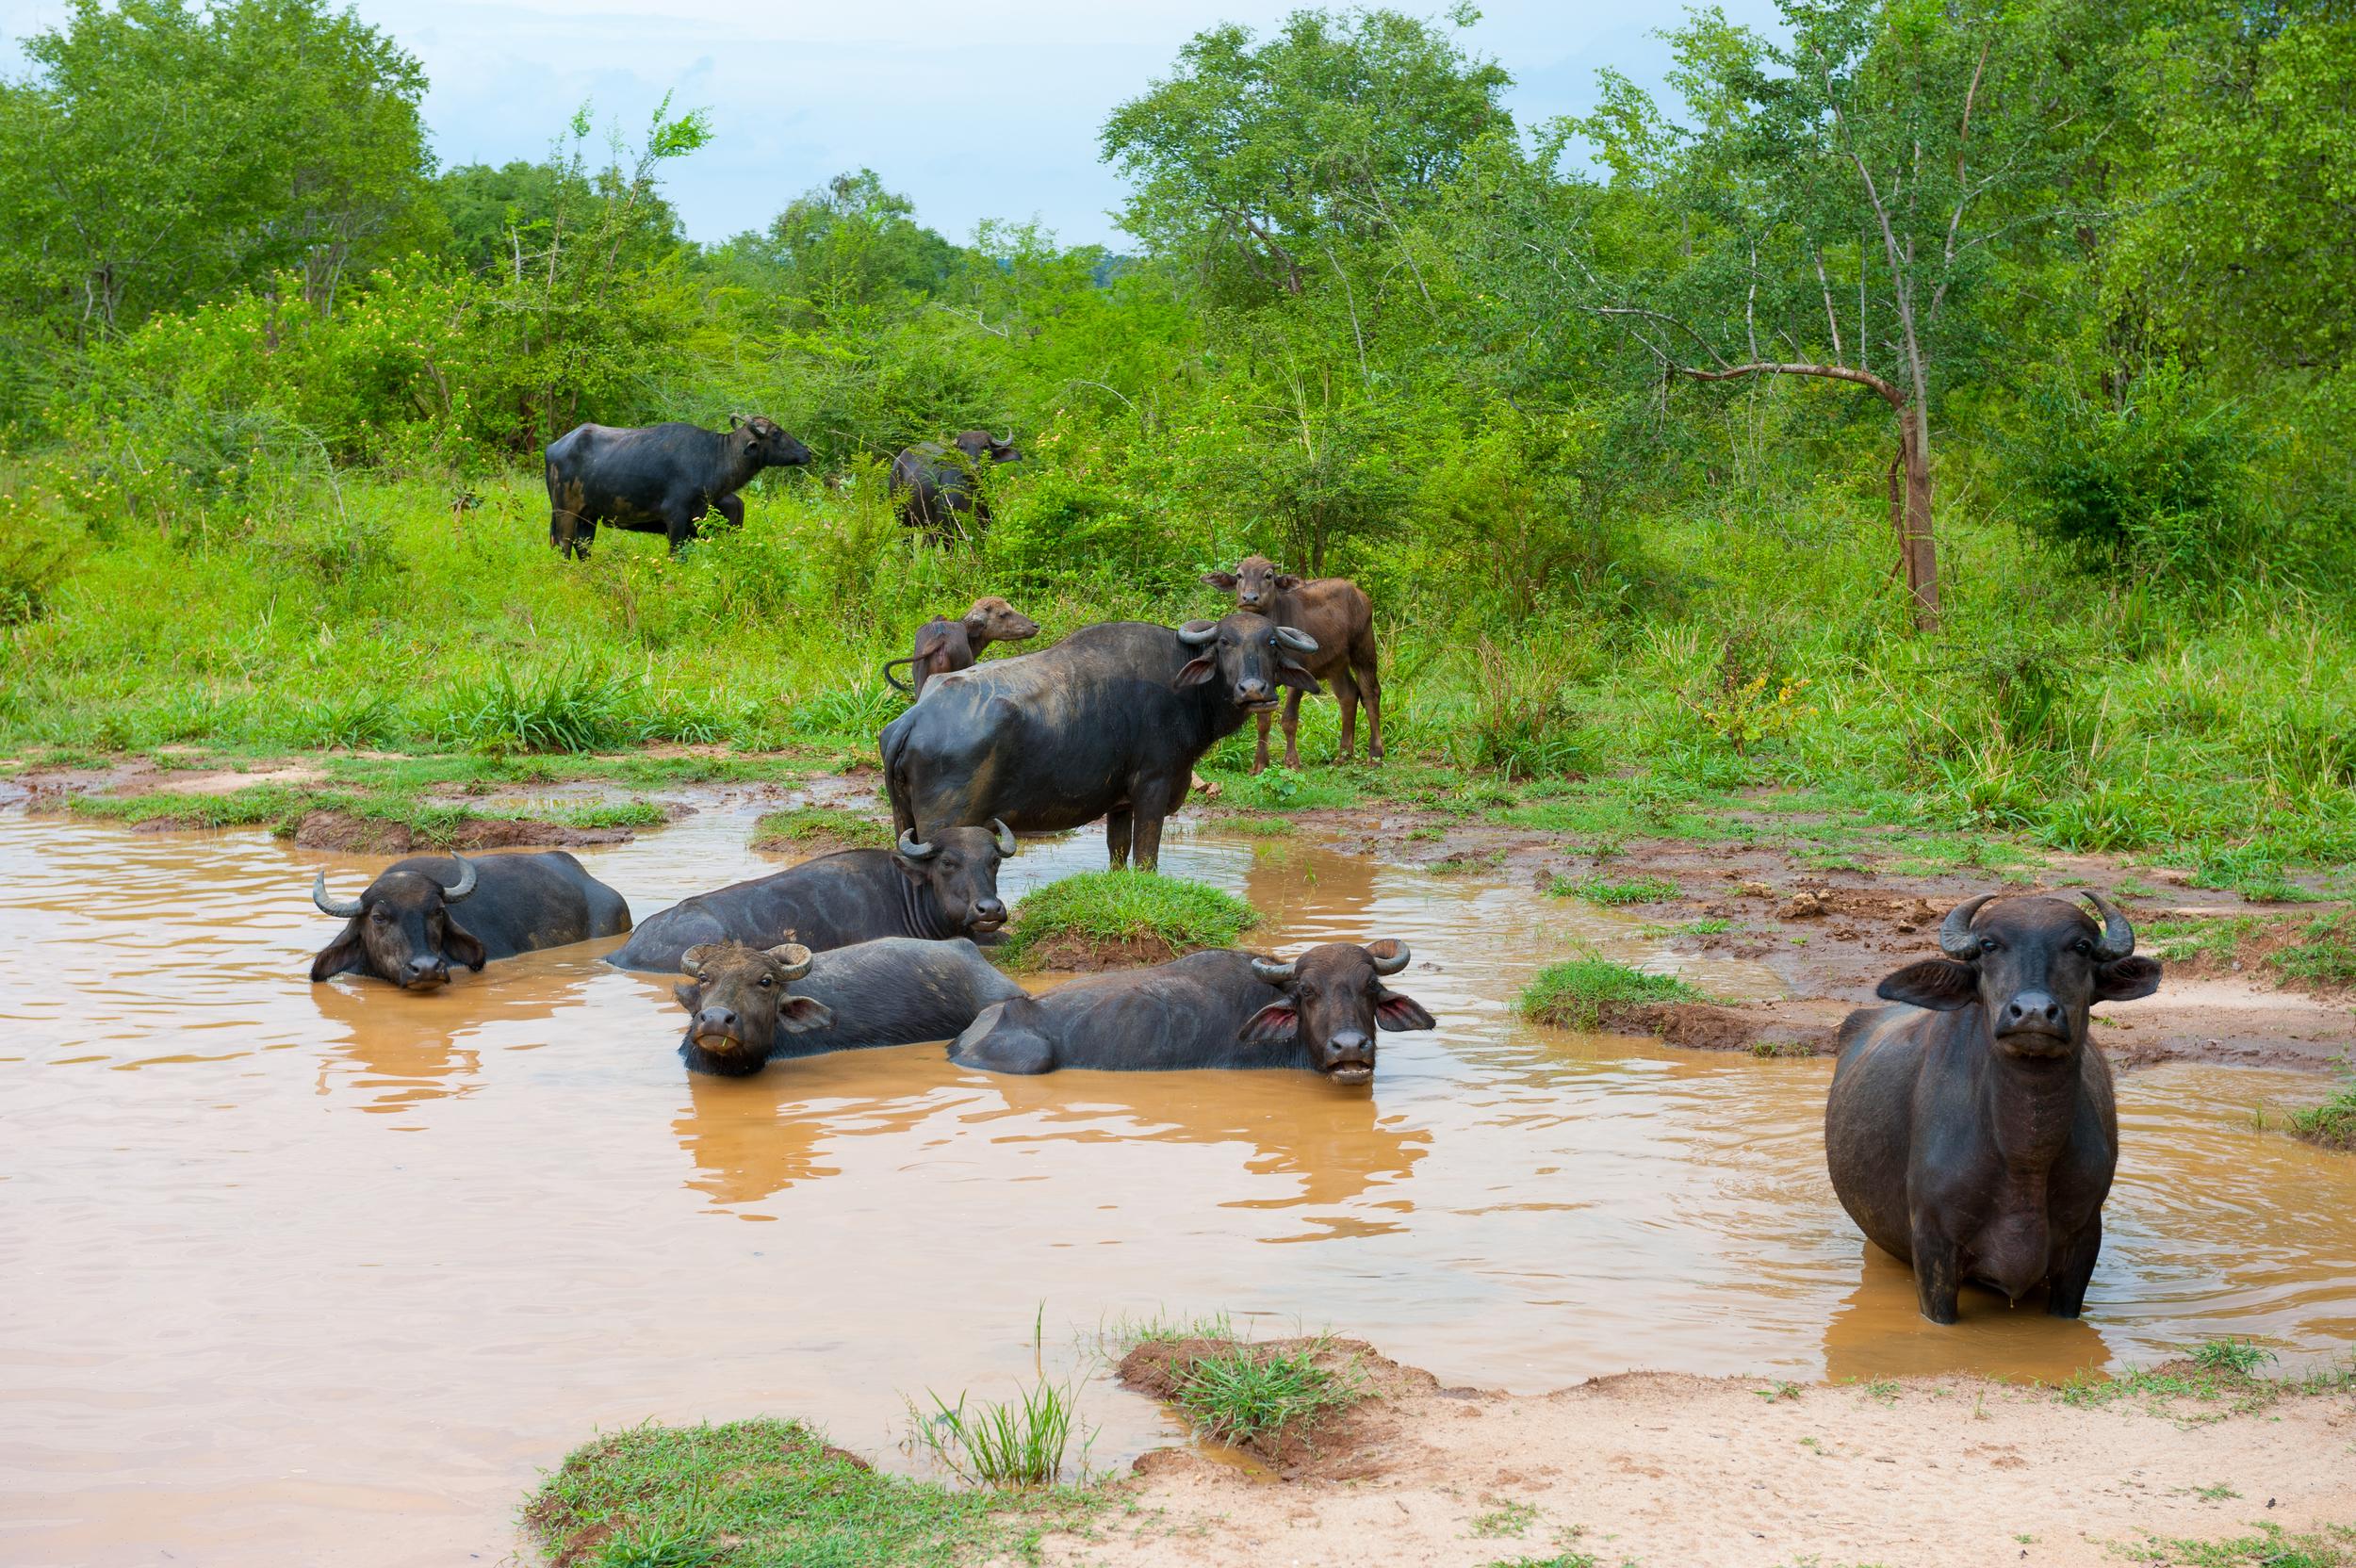 invite-to-paradise-sri-lanka-honeymoon-holiday-wildlife-safari-water-buffalo.jpg